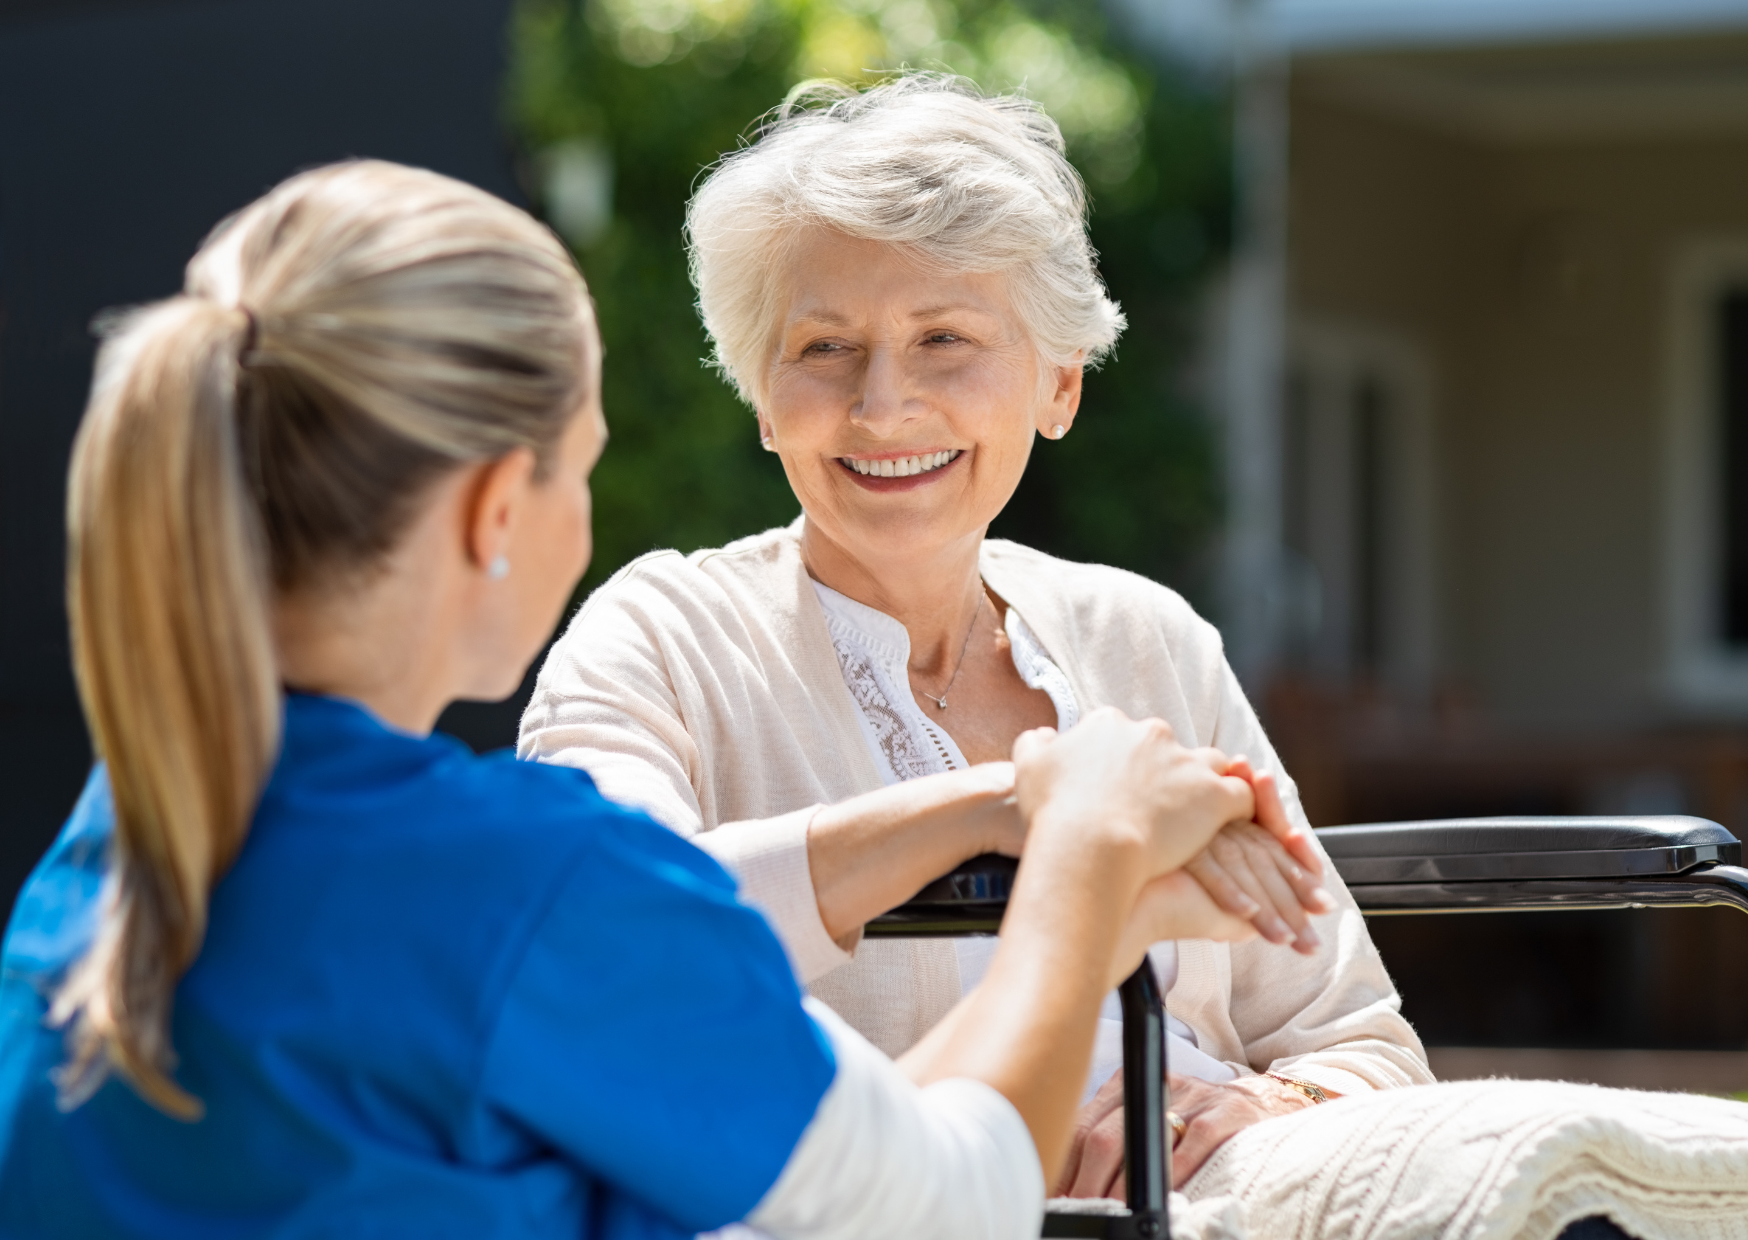 【Saitama, Kitakatsushika】 Care worker in assisted living facility